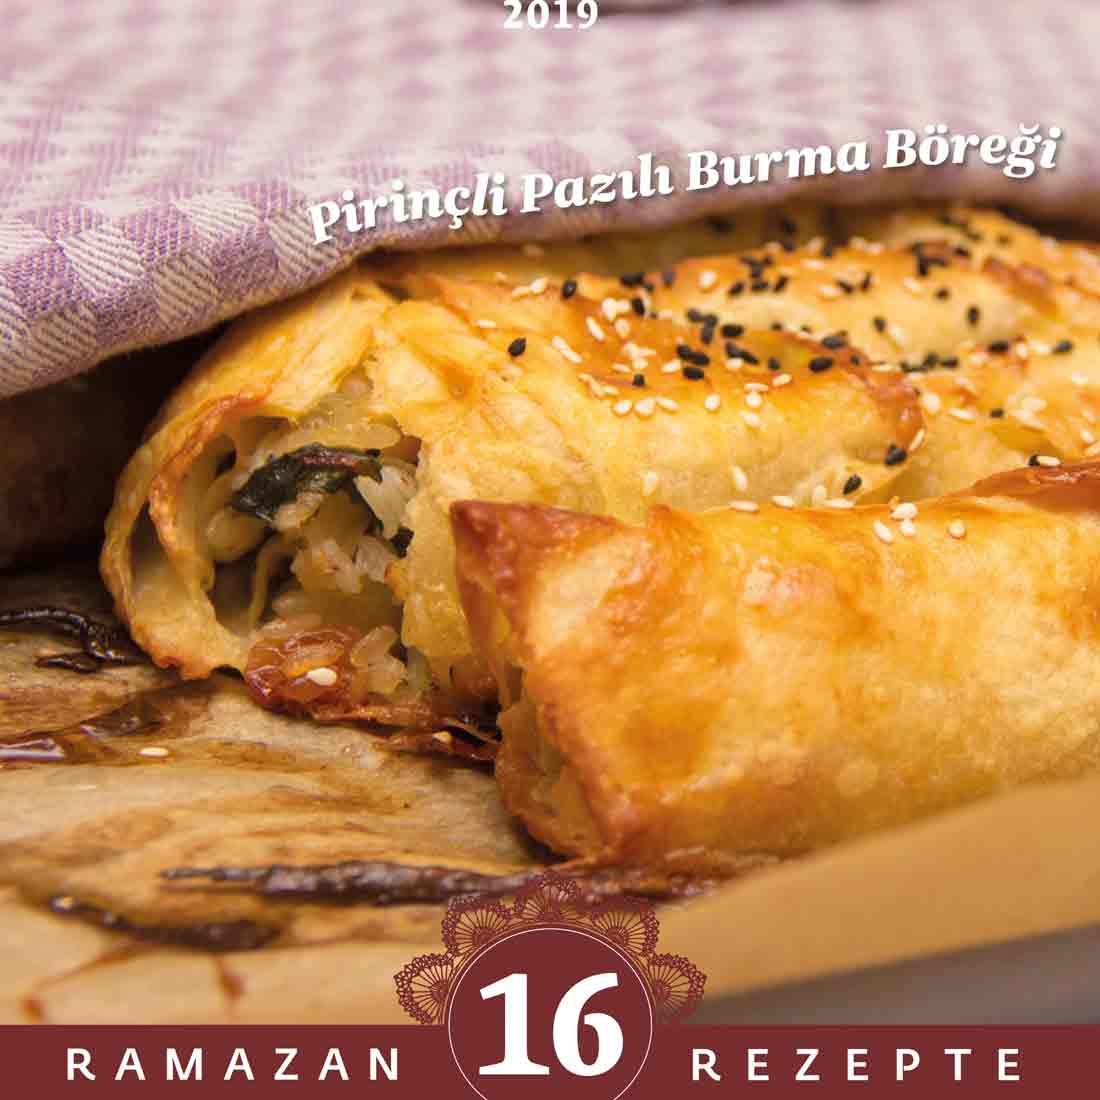 Ramadan 2019 jpeg 16